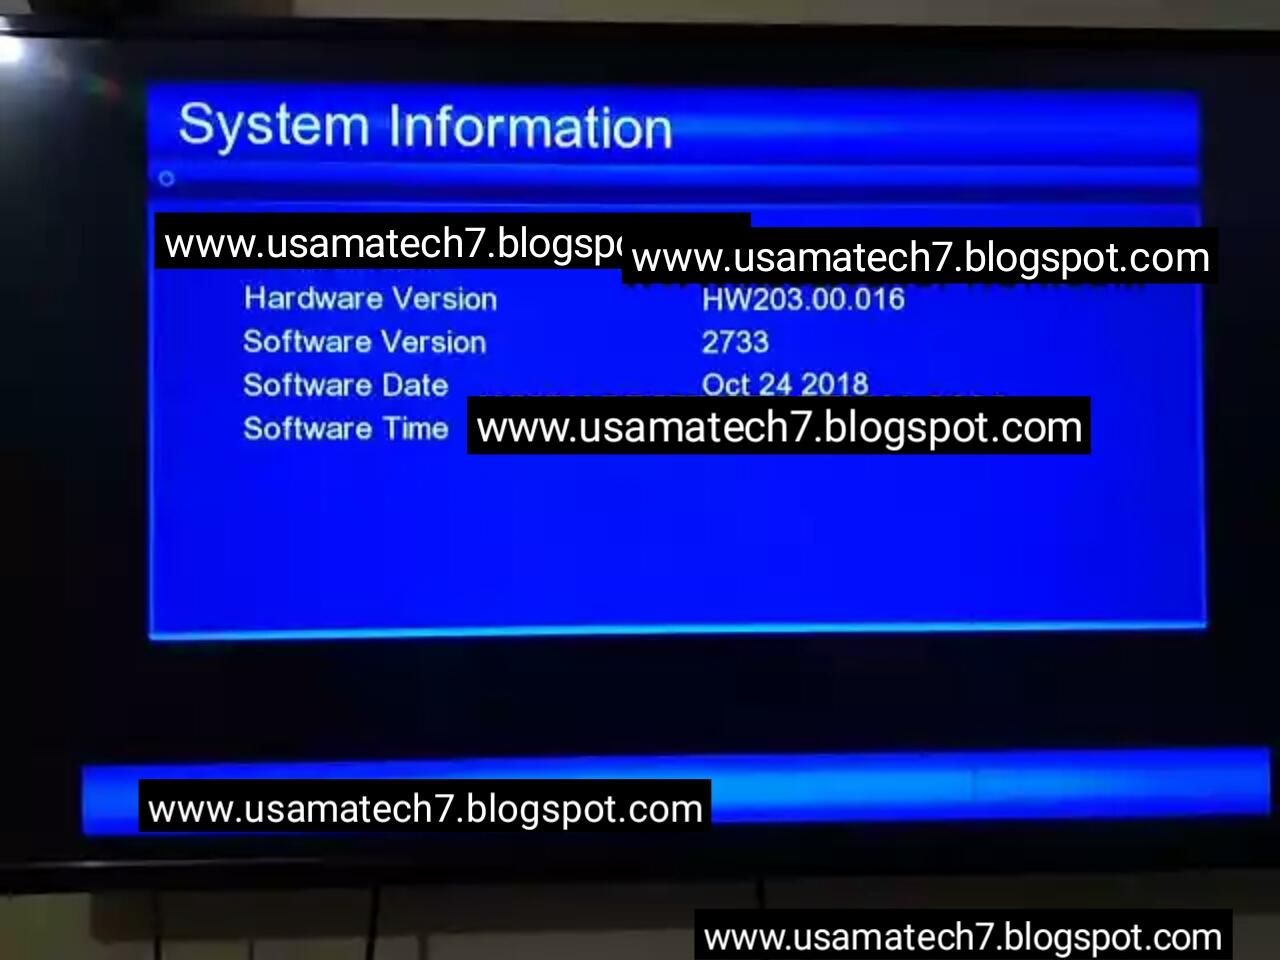 GX6605S H/W203 00 016 Type HD Receiver Power VU Key New